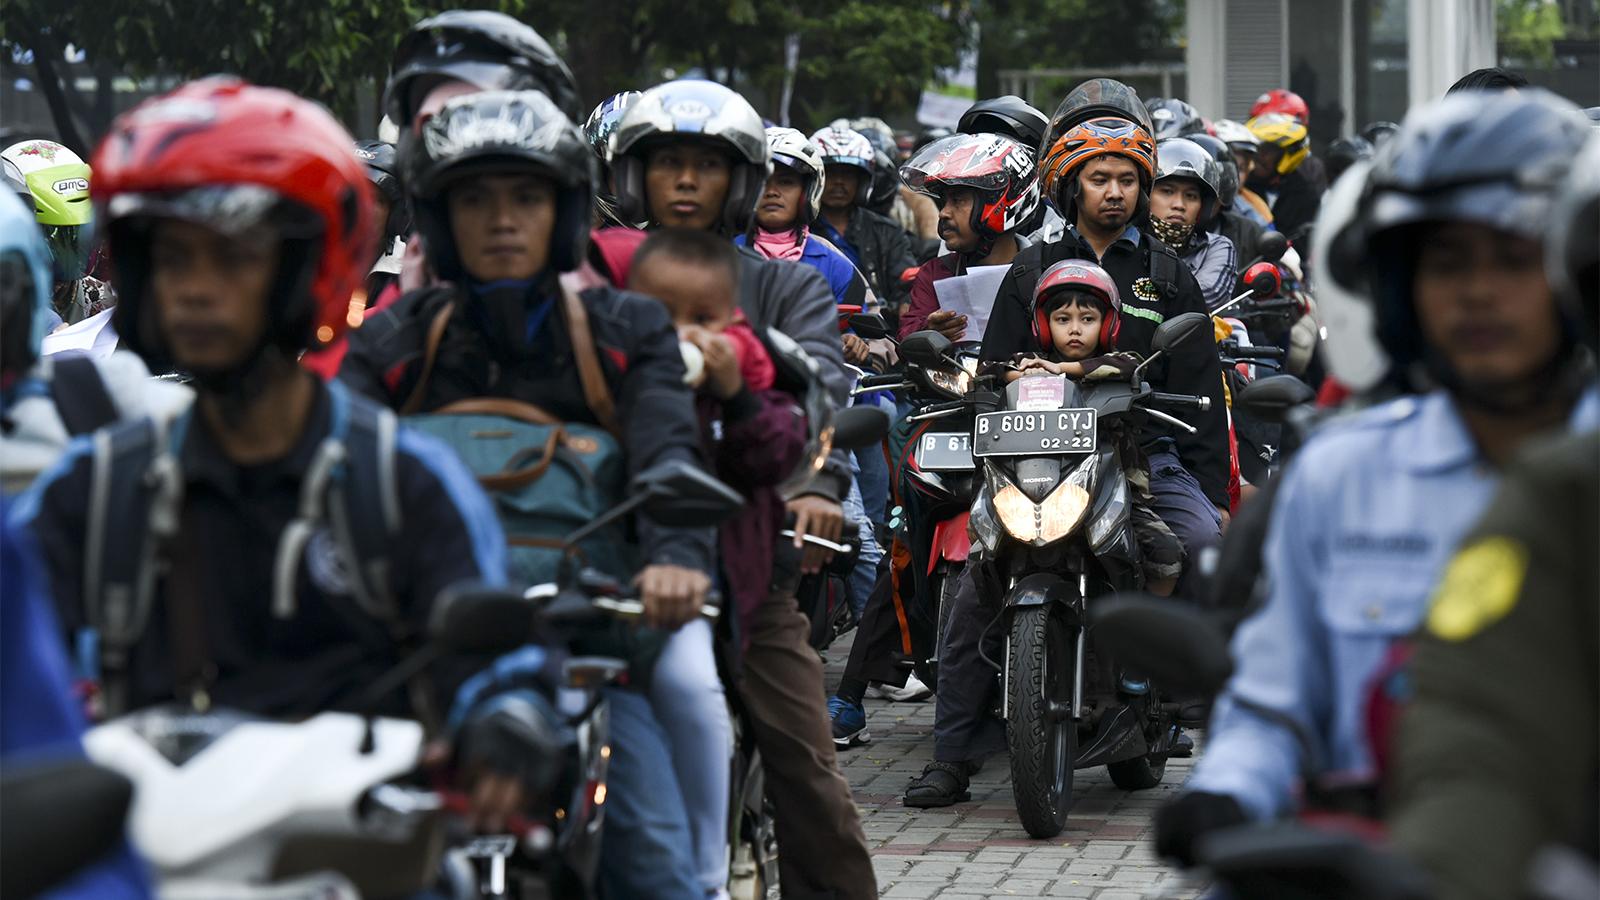 Buat Pemotor, Jangan Lakukan Ini Kalau Masih Sayang Anak